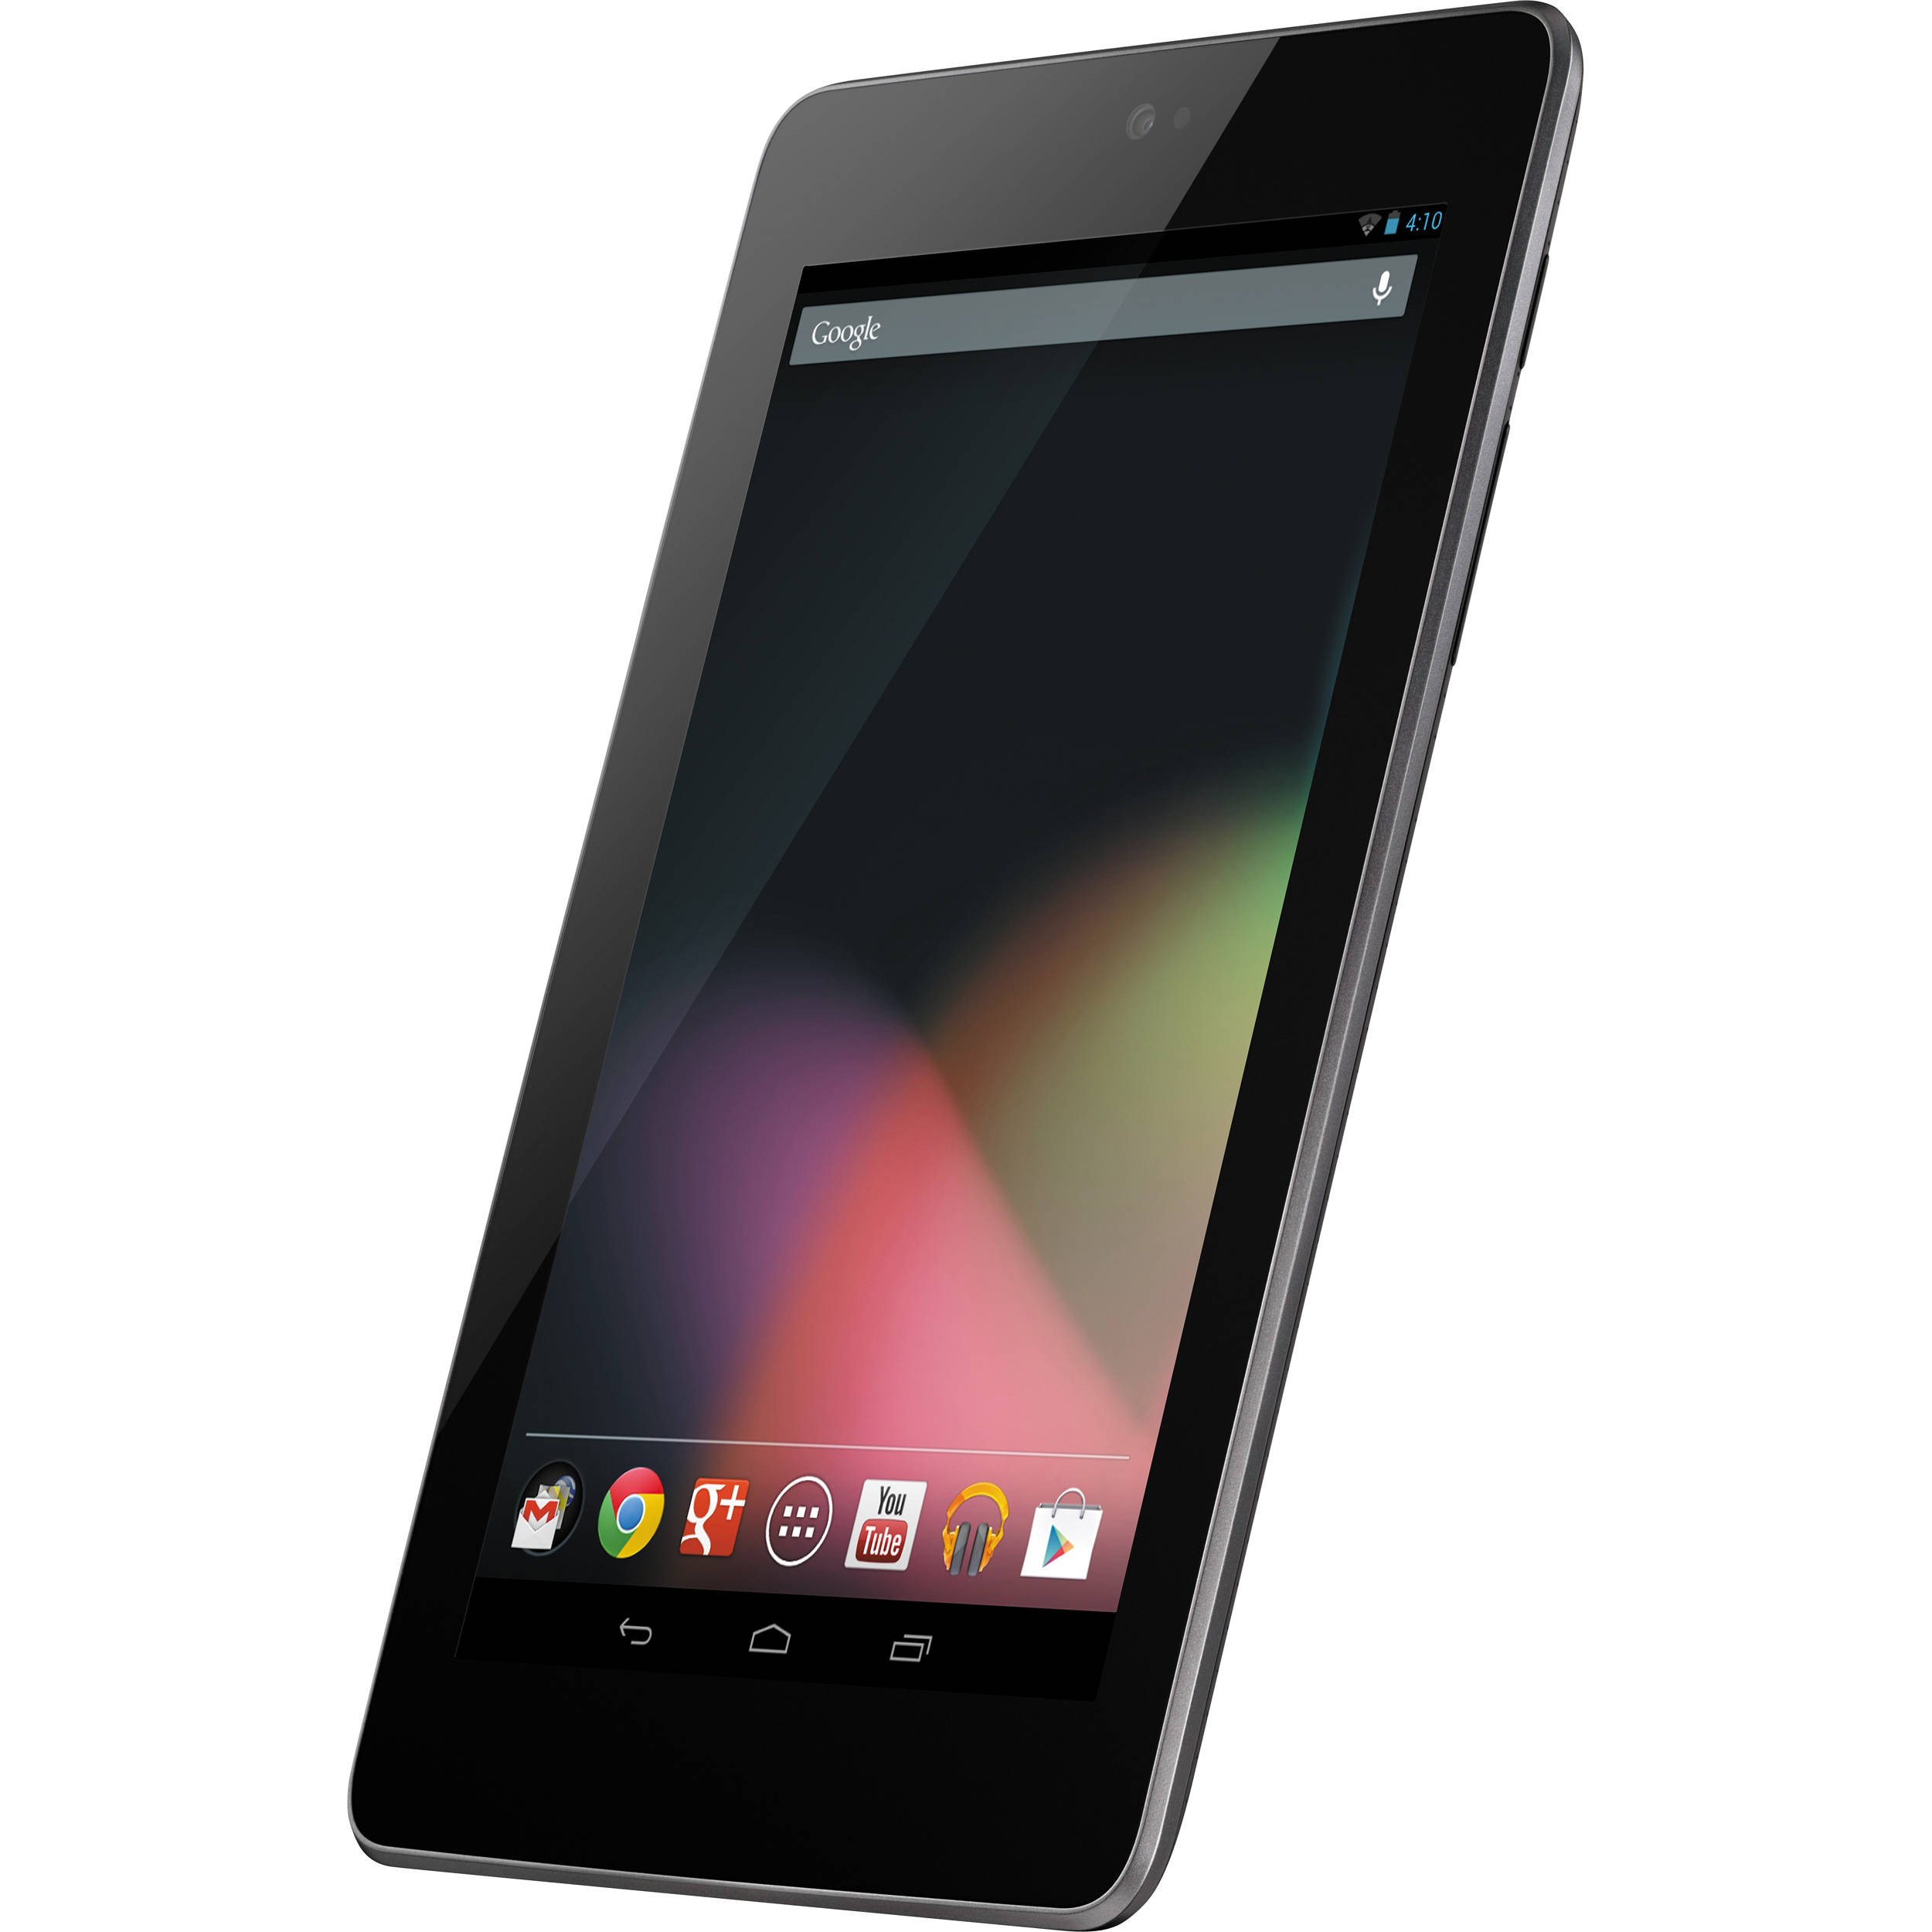 "Google Cardboard for Nexus 7 asus 32gb Google Nexus 7"" Tablet Nexus7 asus 1b32 4g B&h"